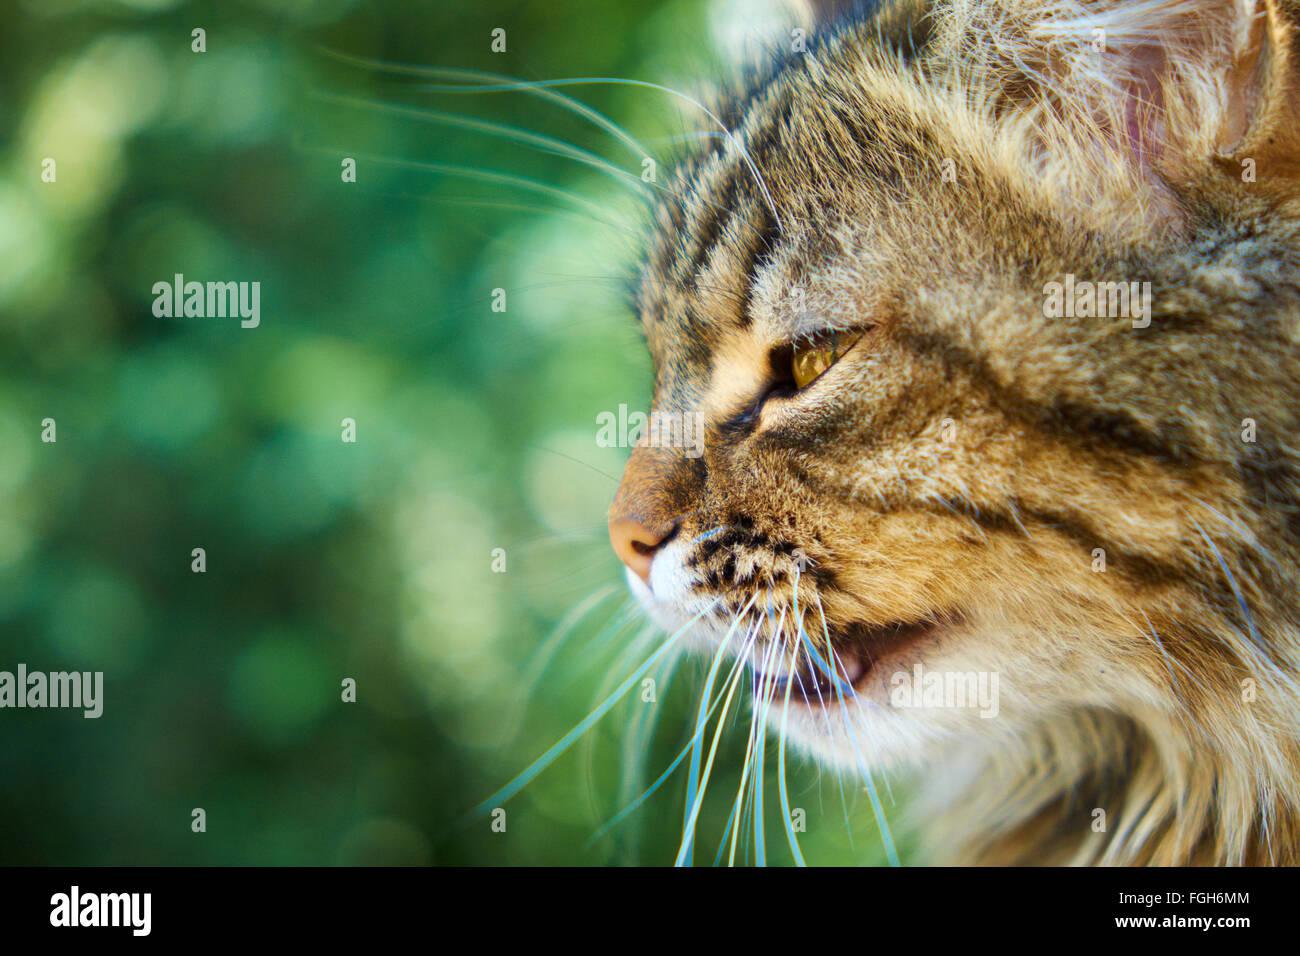 Yellow-brown cat roars, profile view - Stock Image